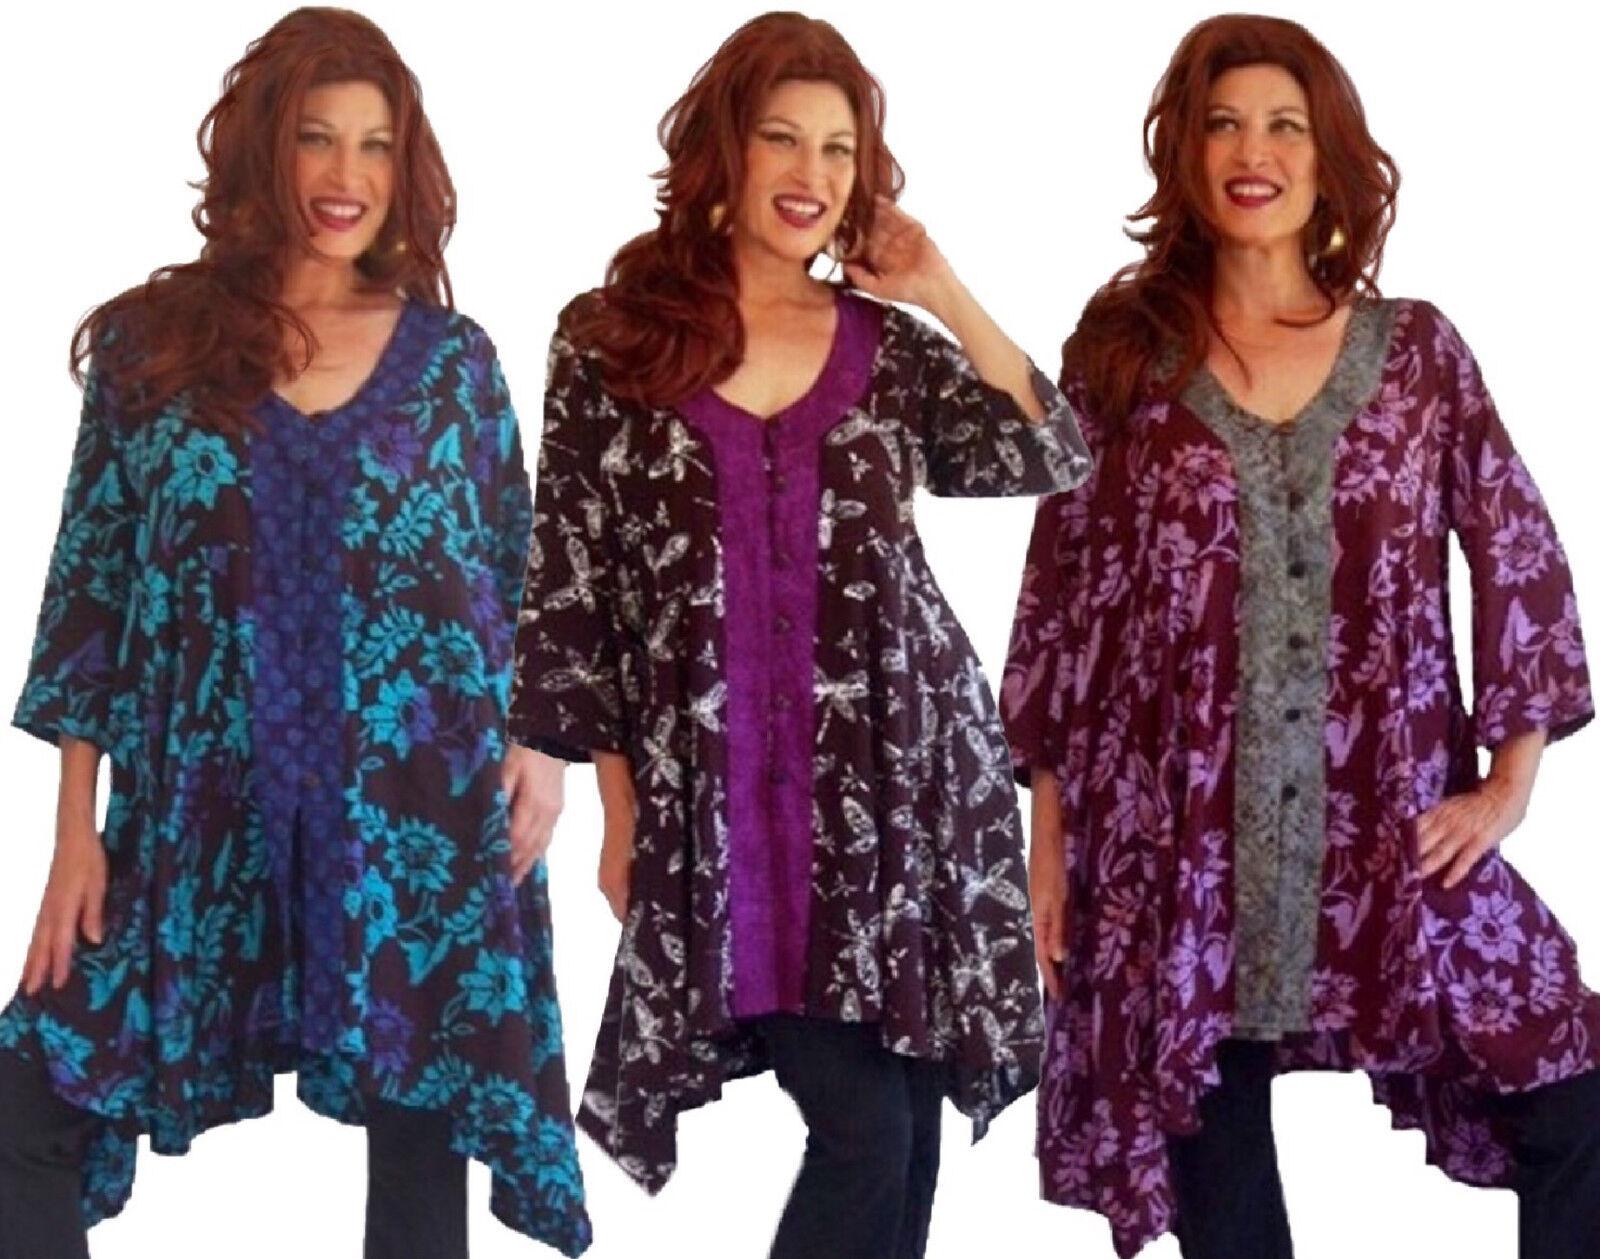 Bohemian Design Shirt Blouse - Art Batik Buttons - Plus Größes I621 LotusTraders